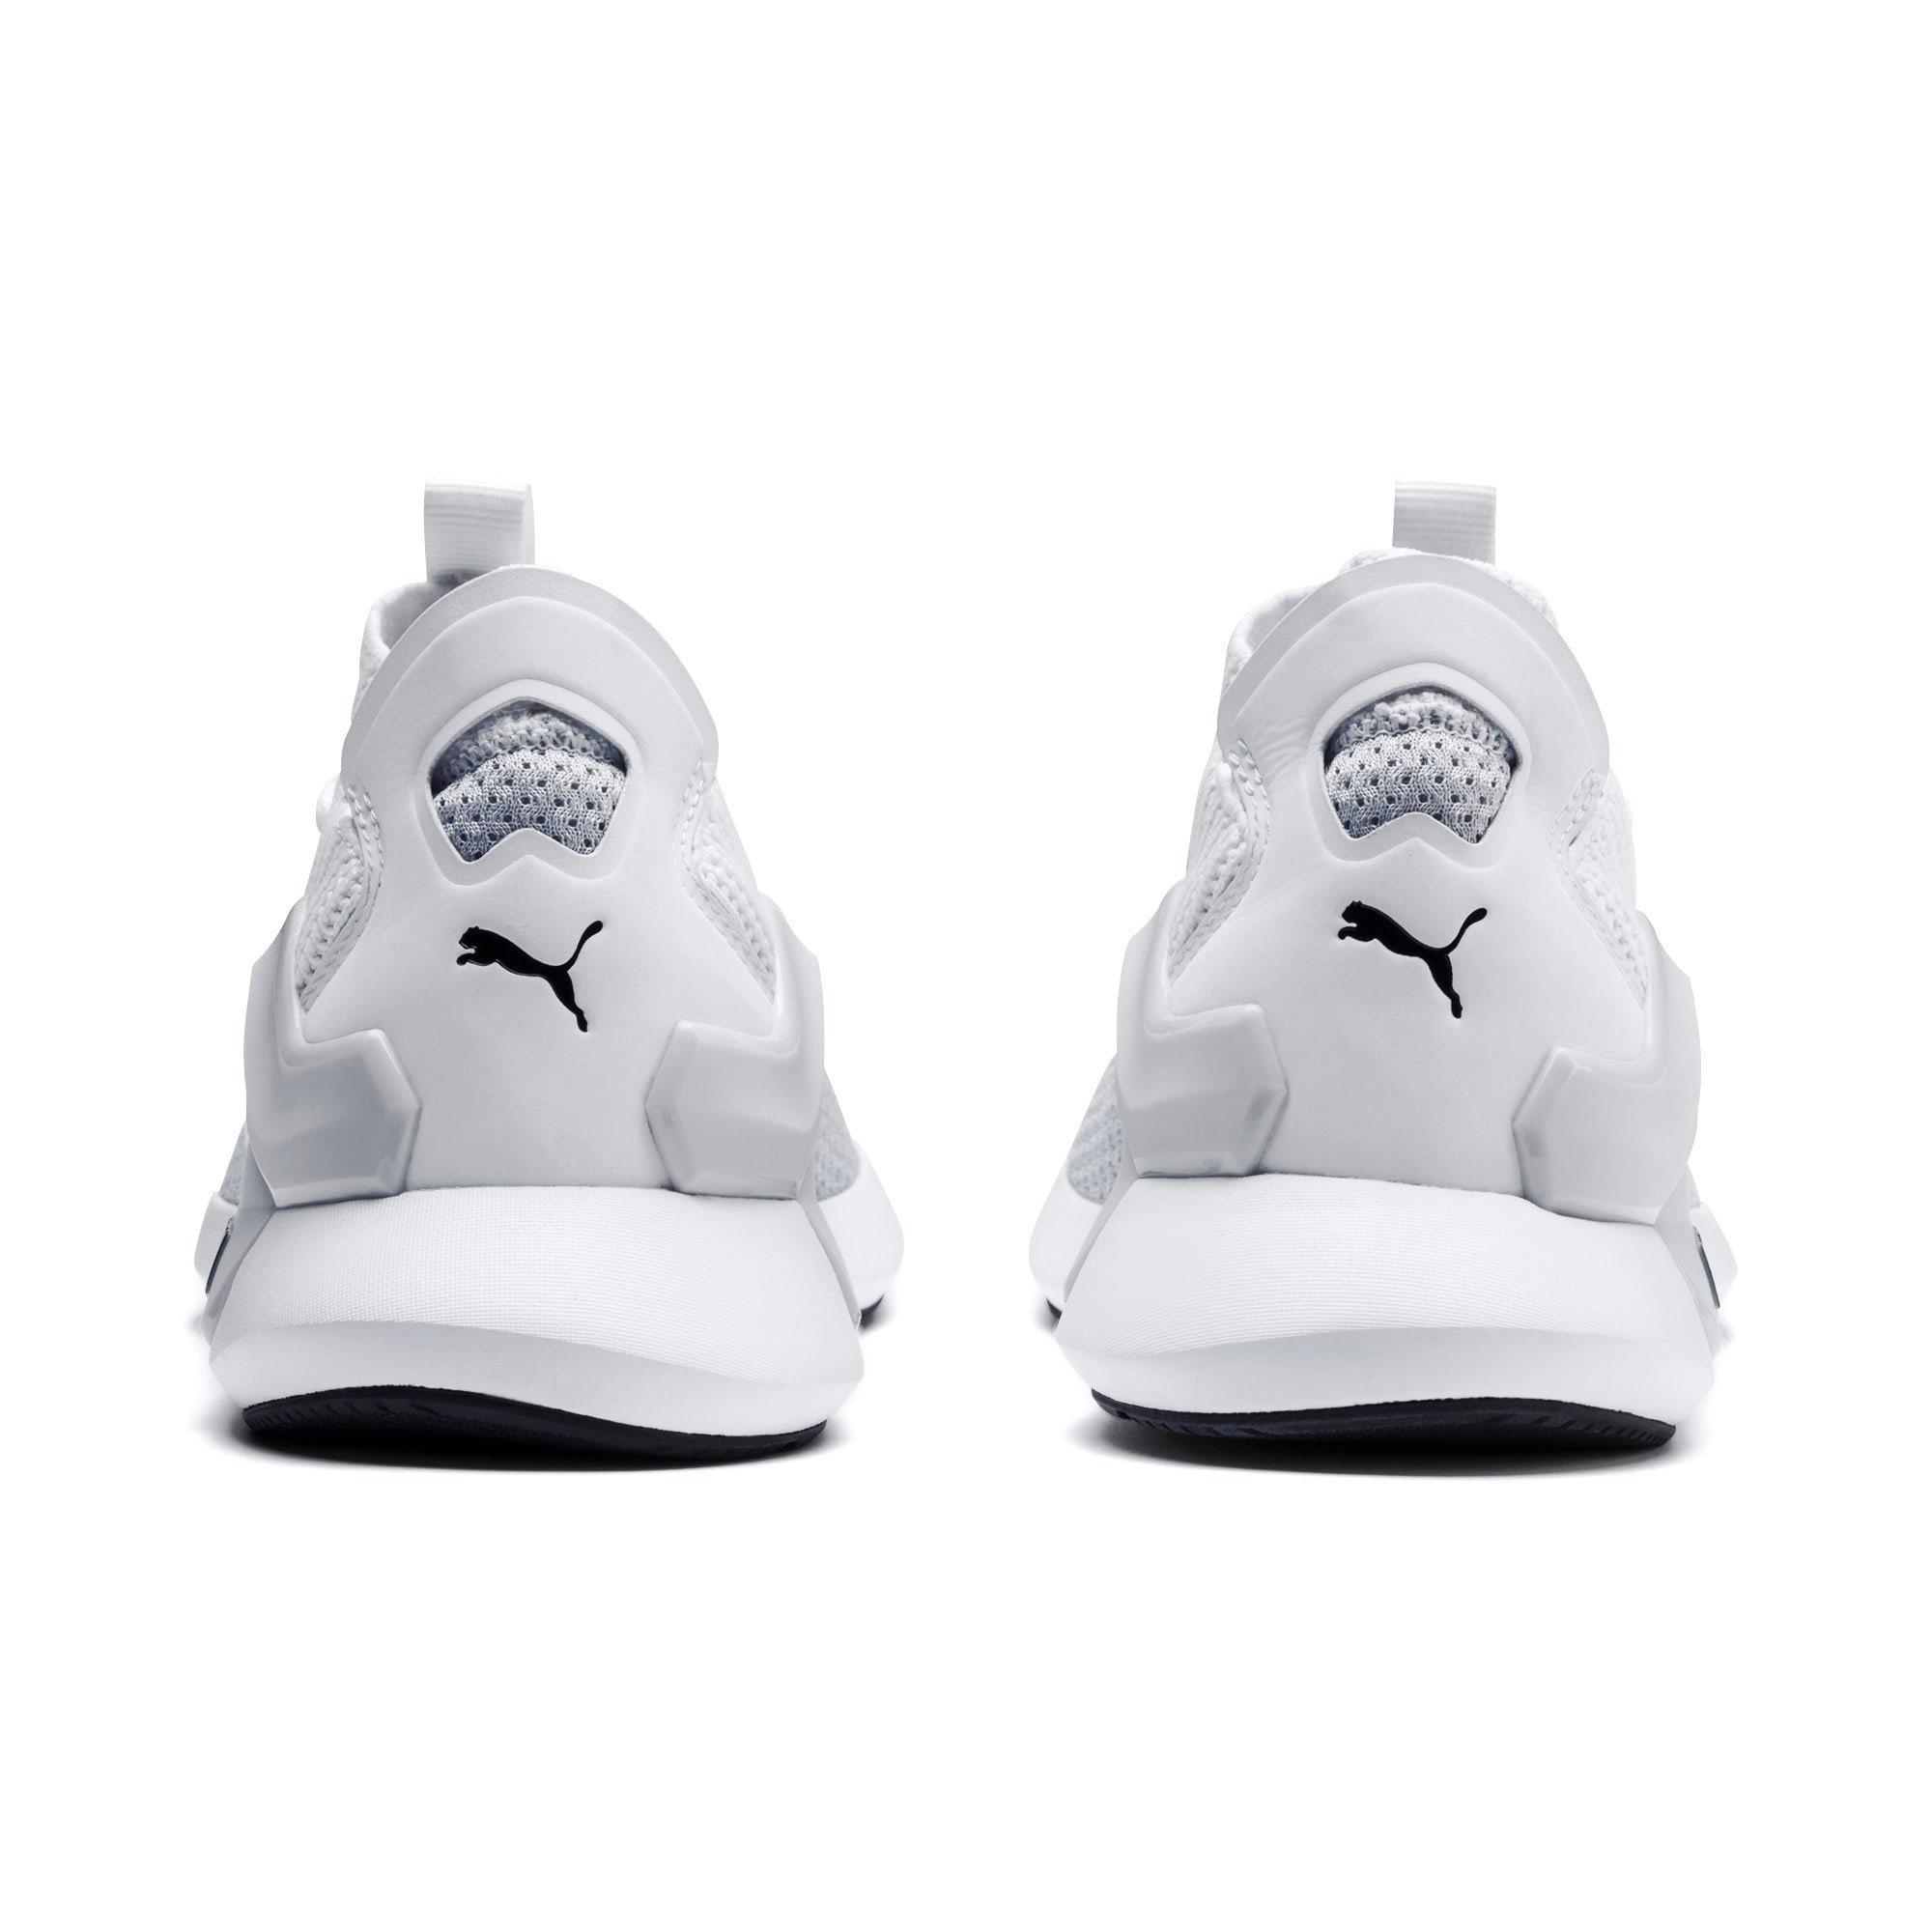 Thumbnail 4 of Rogue Men's Running Shoes, Puma White-Puma Black, medium